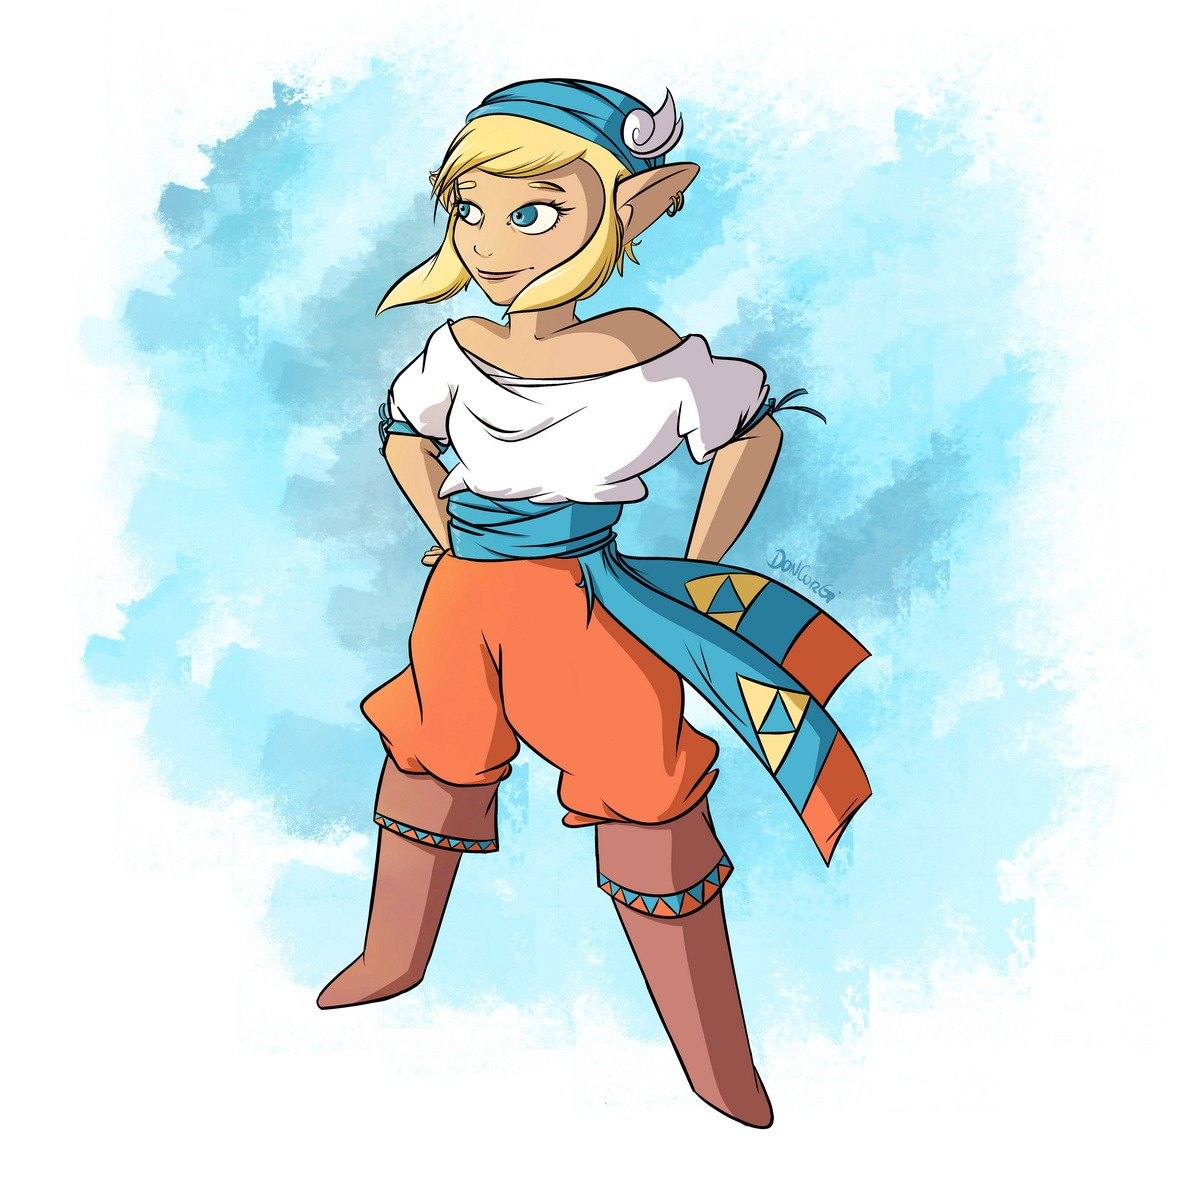 pirate, zelda, oot, ocarina of time, legend of zelda, fan art,